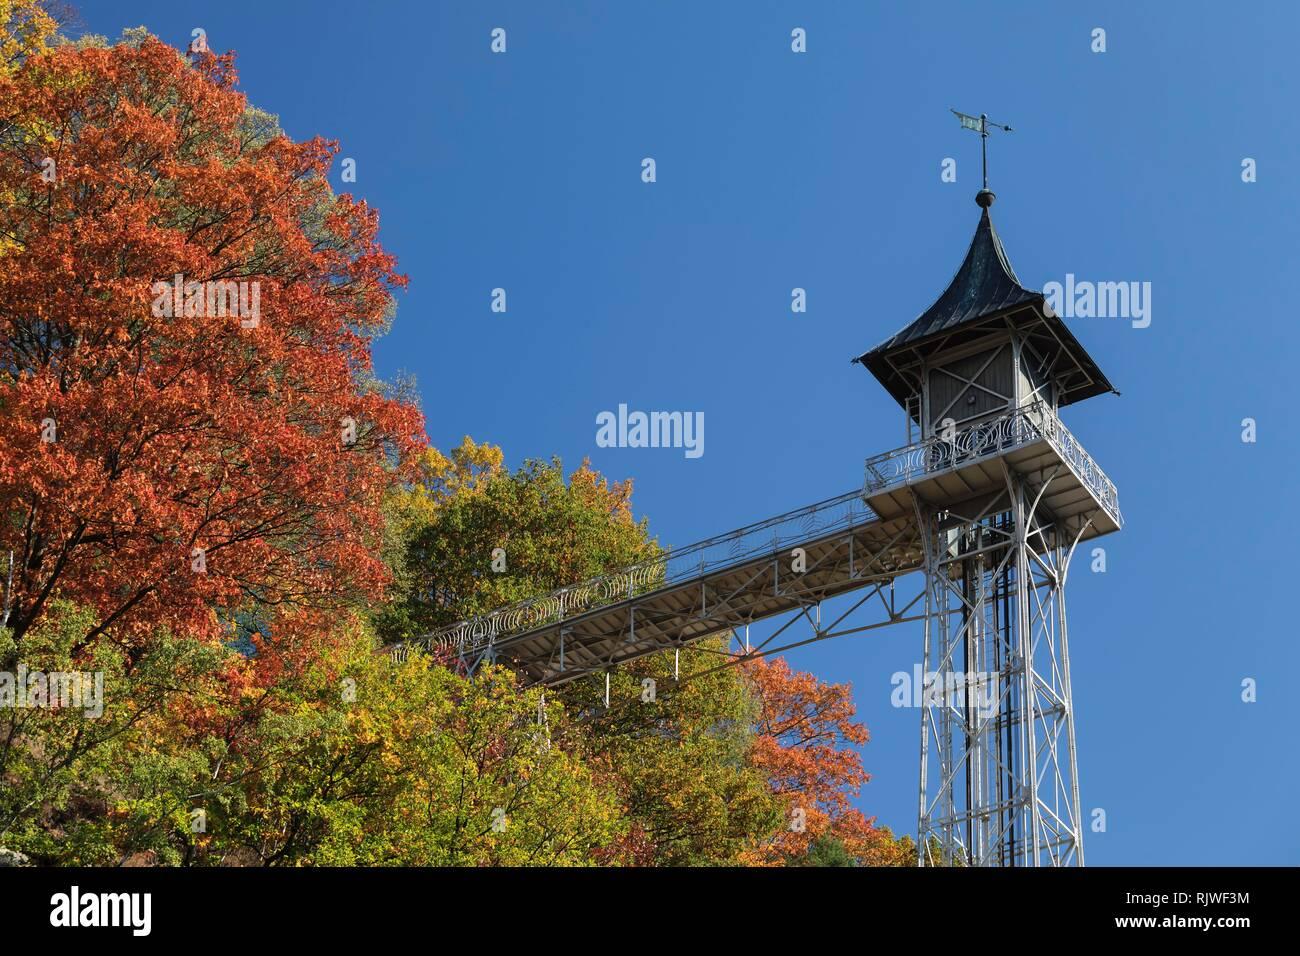 Passenger lift, connects Bad Schandau with Ostrava Scheibe, Art Nouveau, Saxon Switzerland, Saxony, Germany - Stock Image